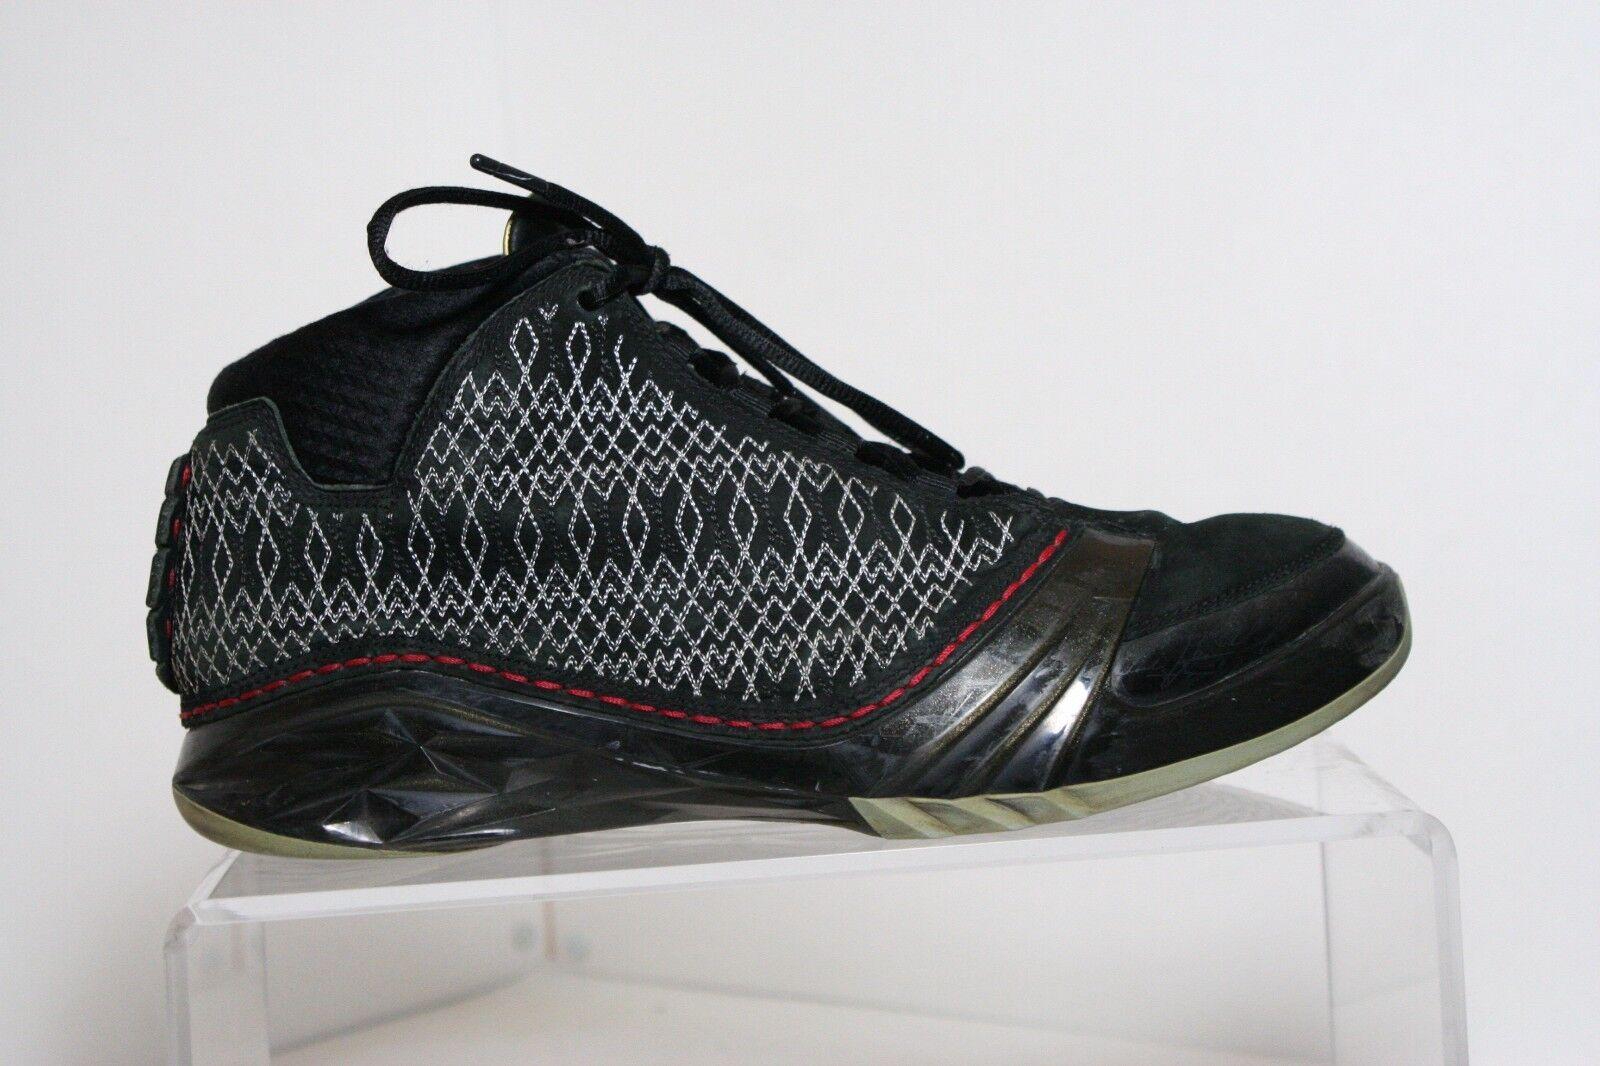 super popular 8b6c2 a4f12 Nike Air 23 XX3 Black Stealth Sneaker 2007 Athletic Multi ...